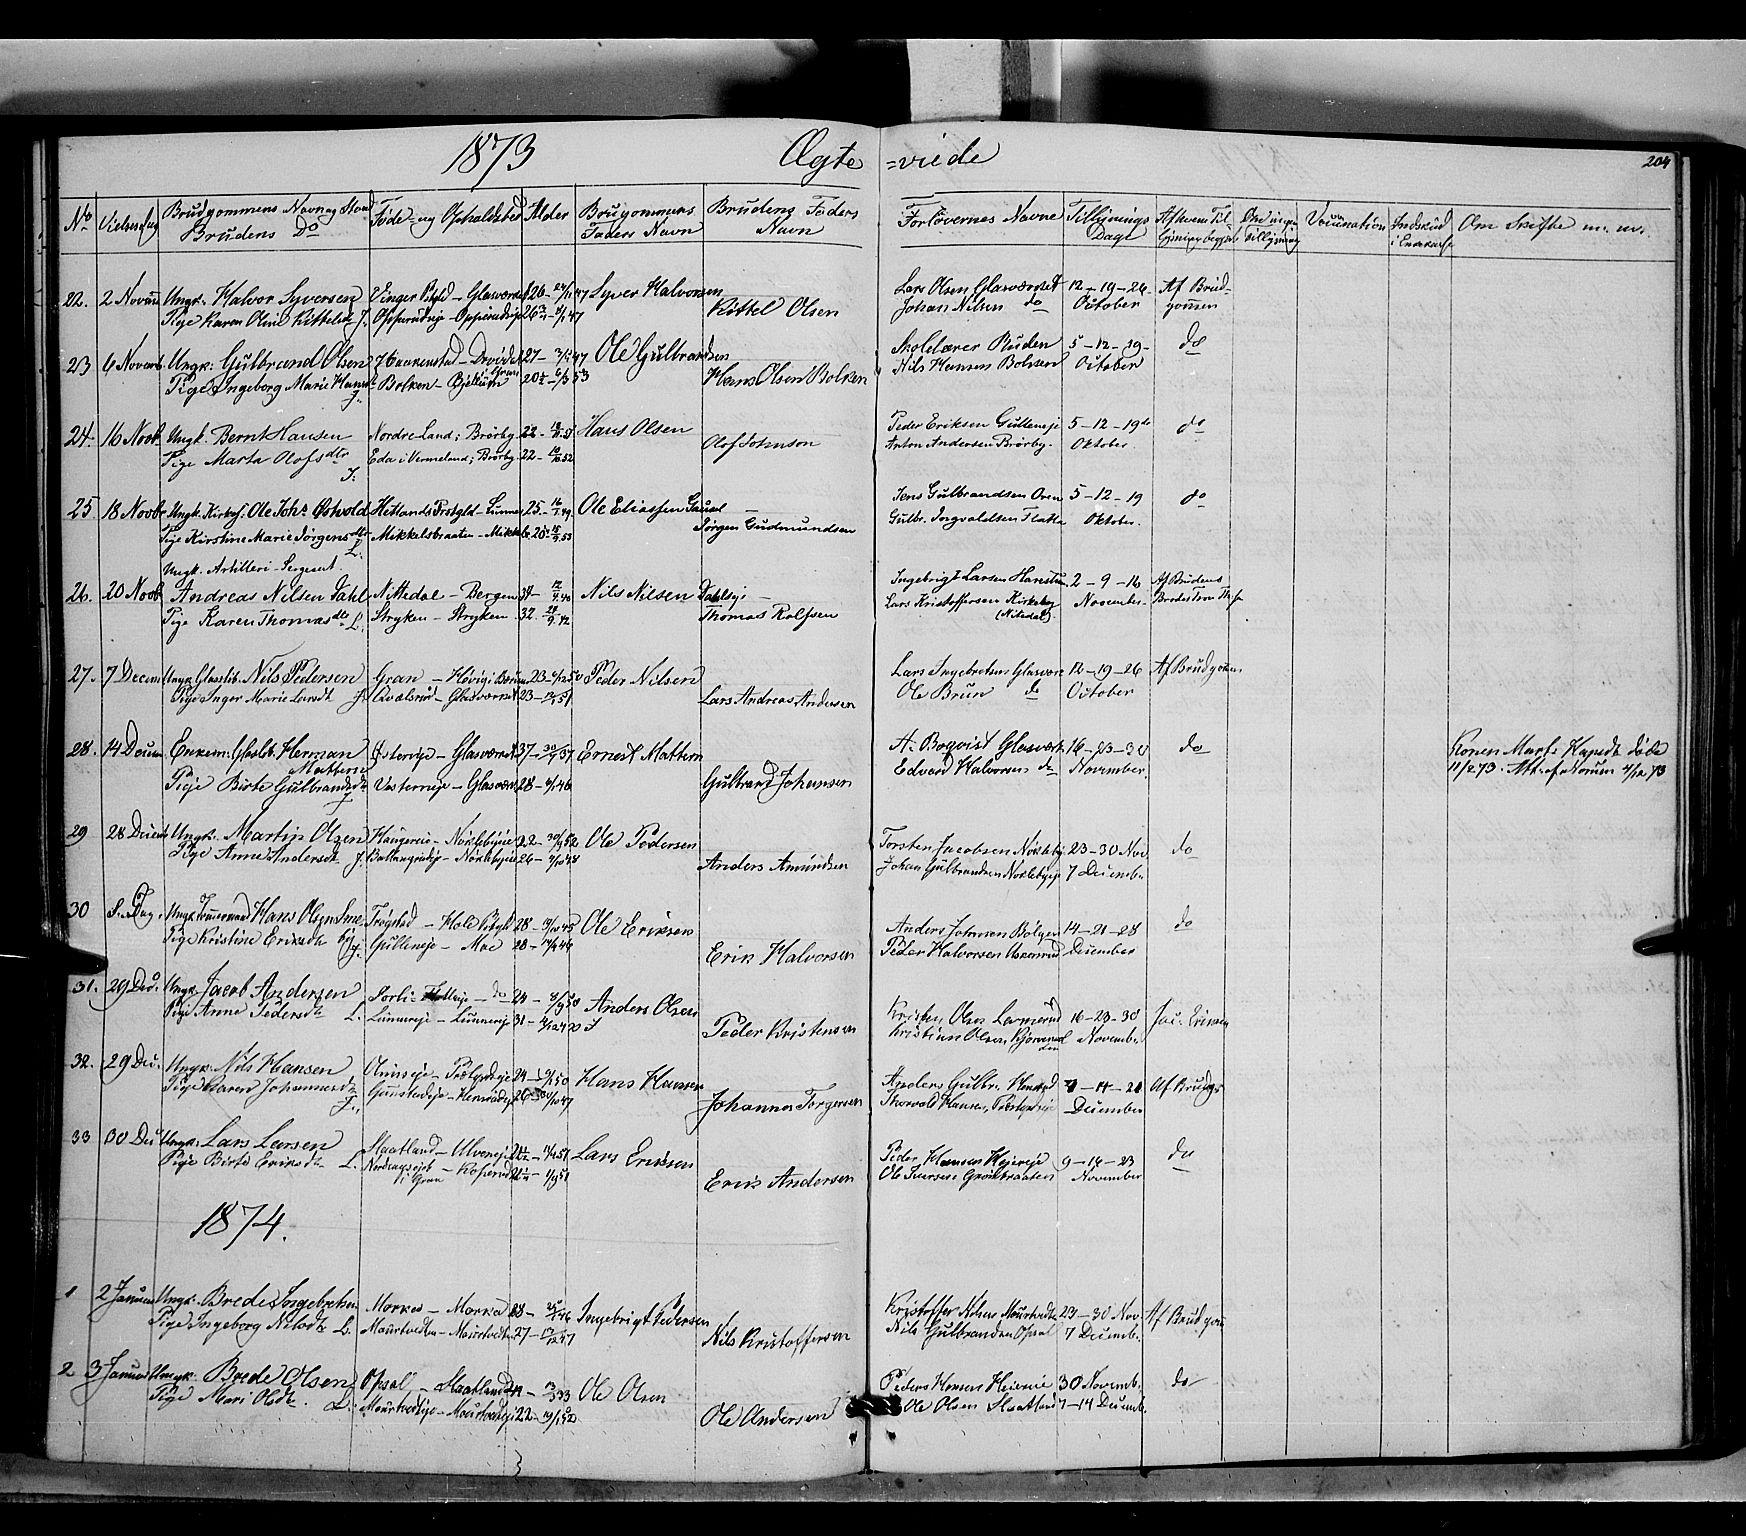 SAH, Jevnaker prestekontor, Ministerialbok nr. 7, 1858-1876, s. 204